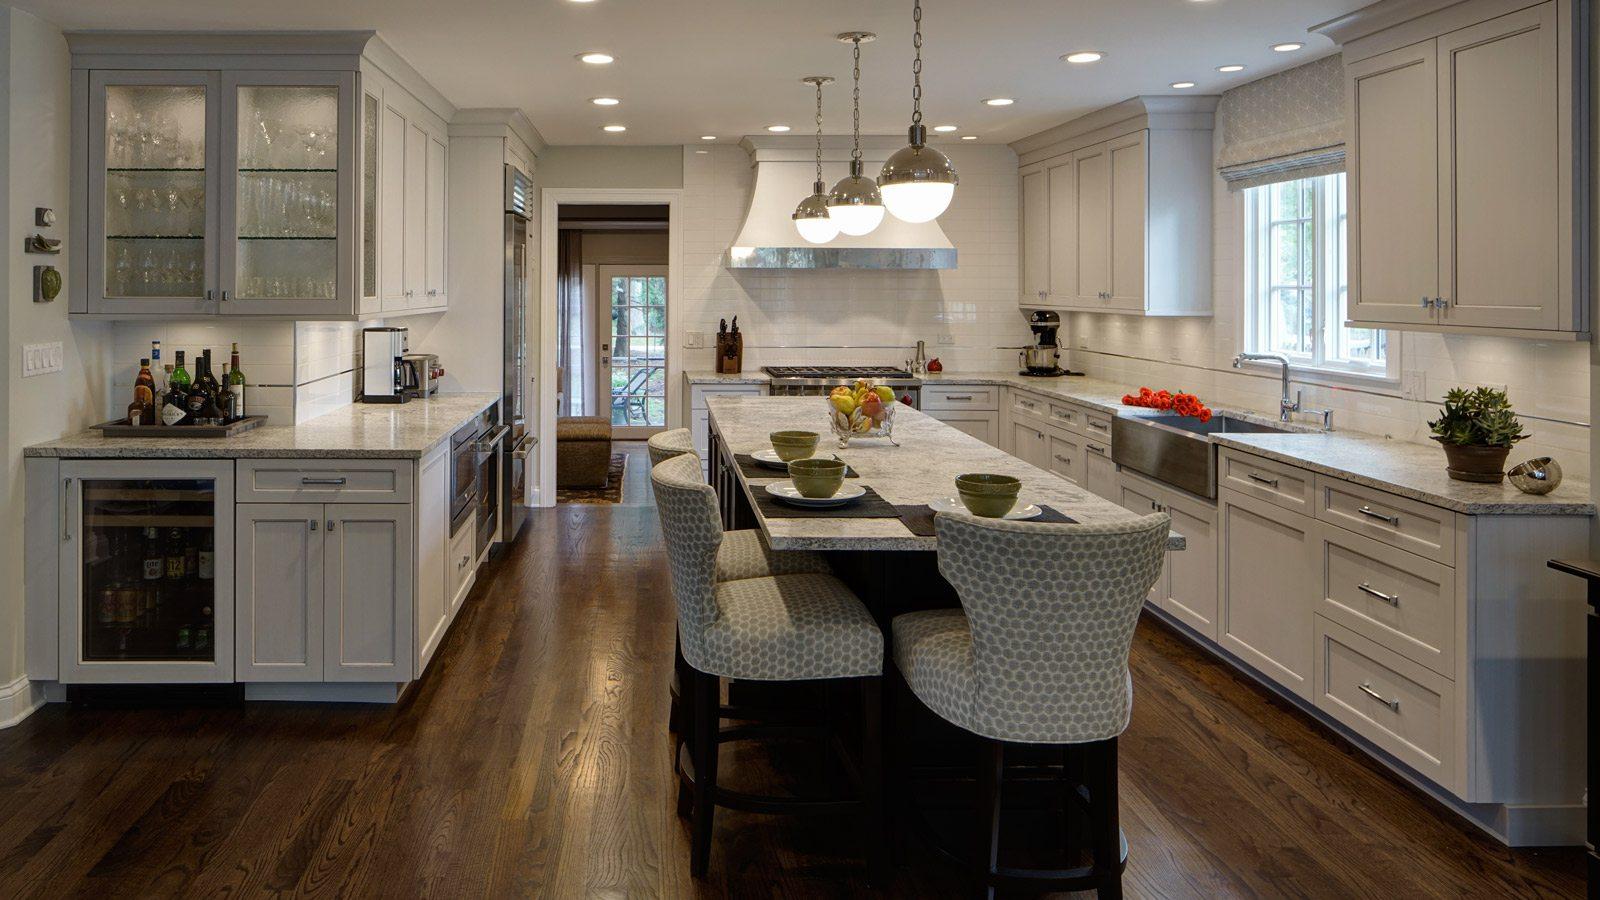 1600 x 900 L Shaped Kitchen Design Perfected Hinsdale IL drury design 1